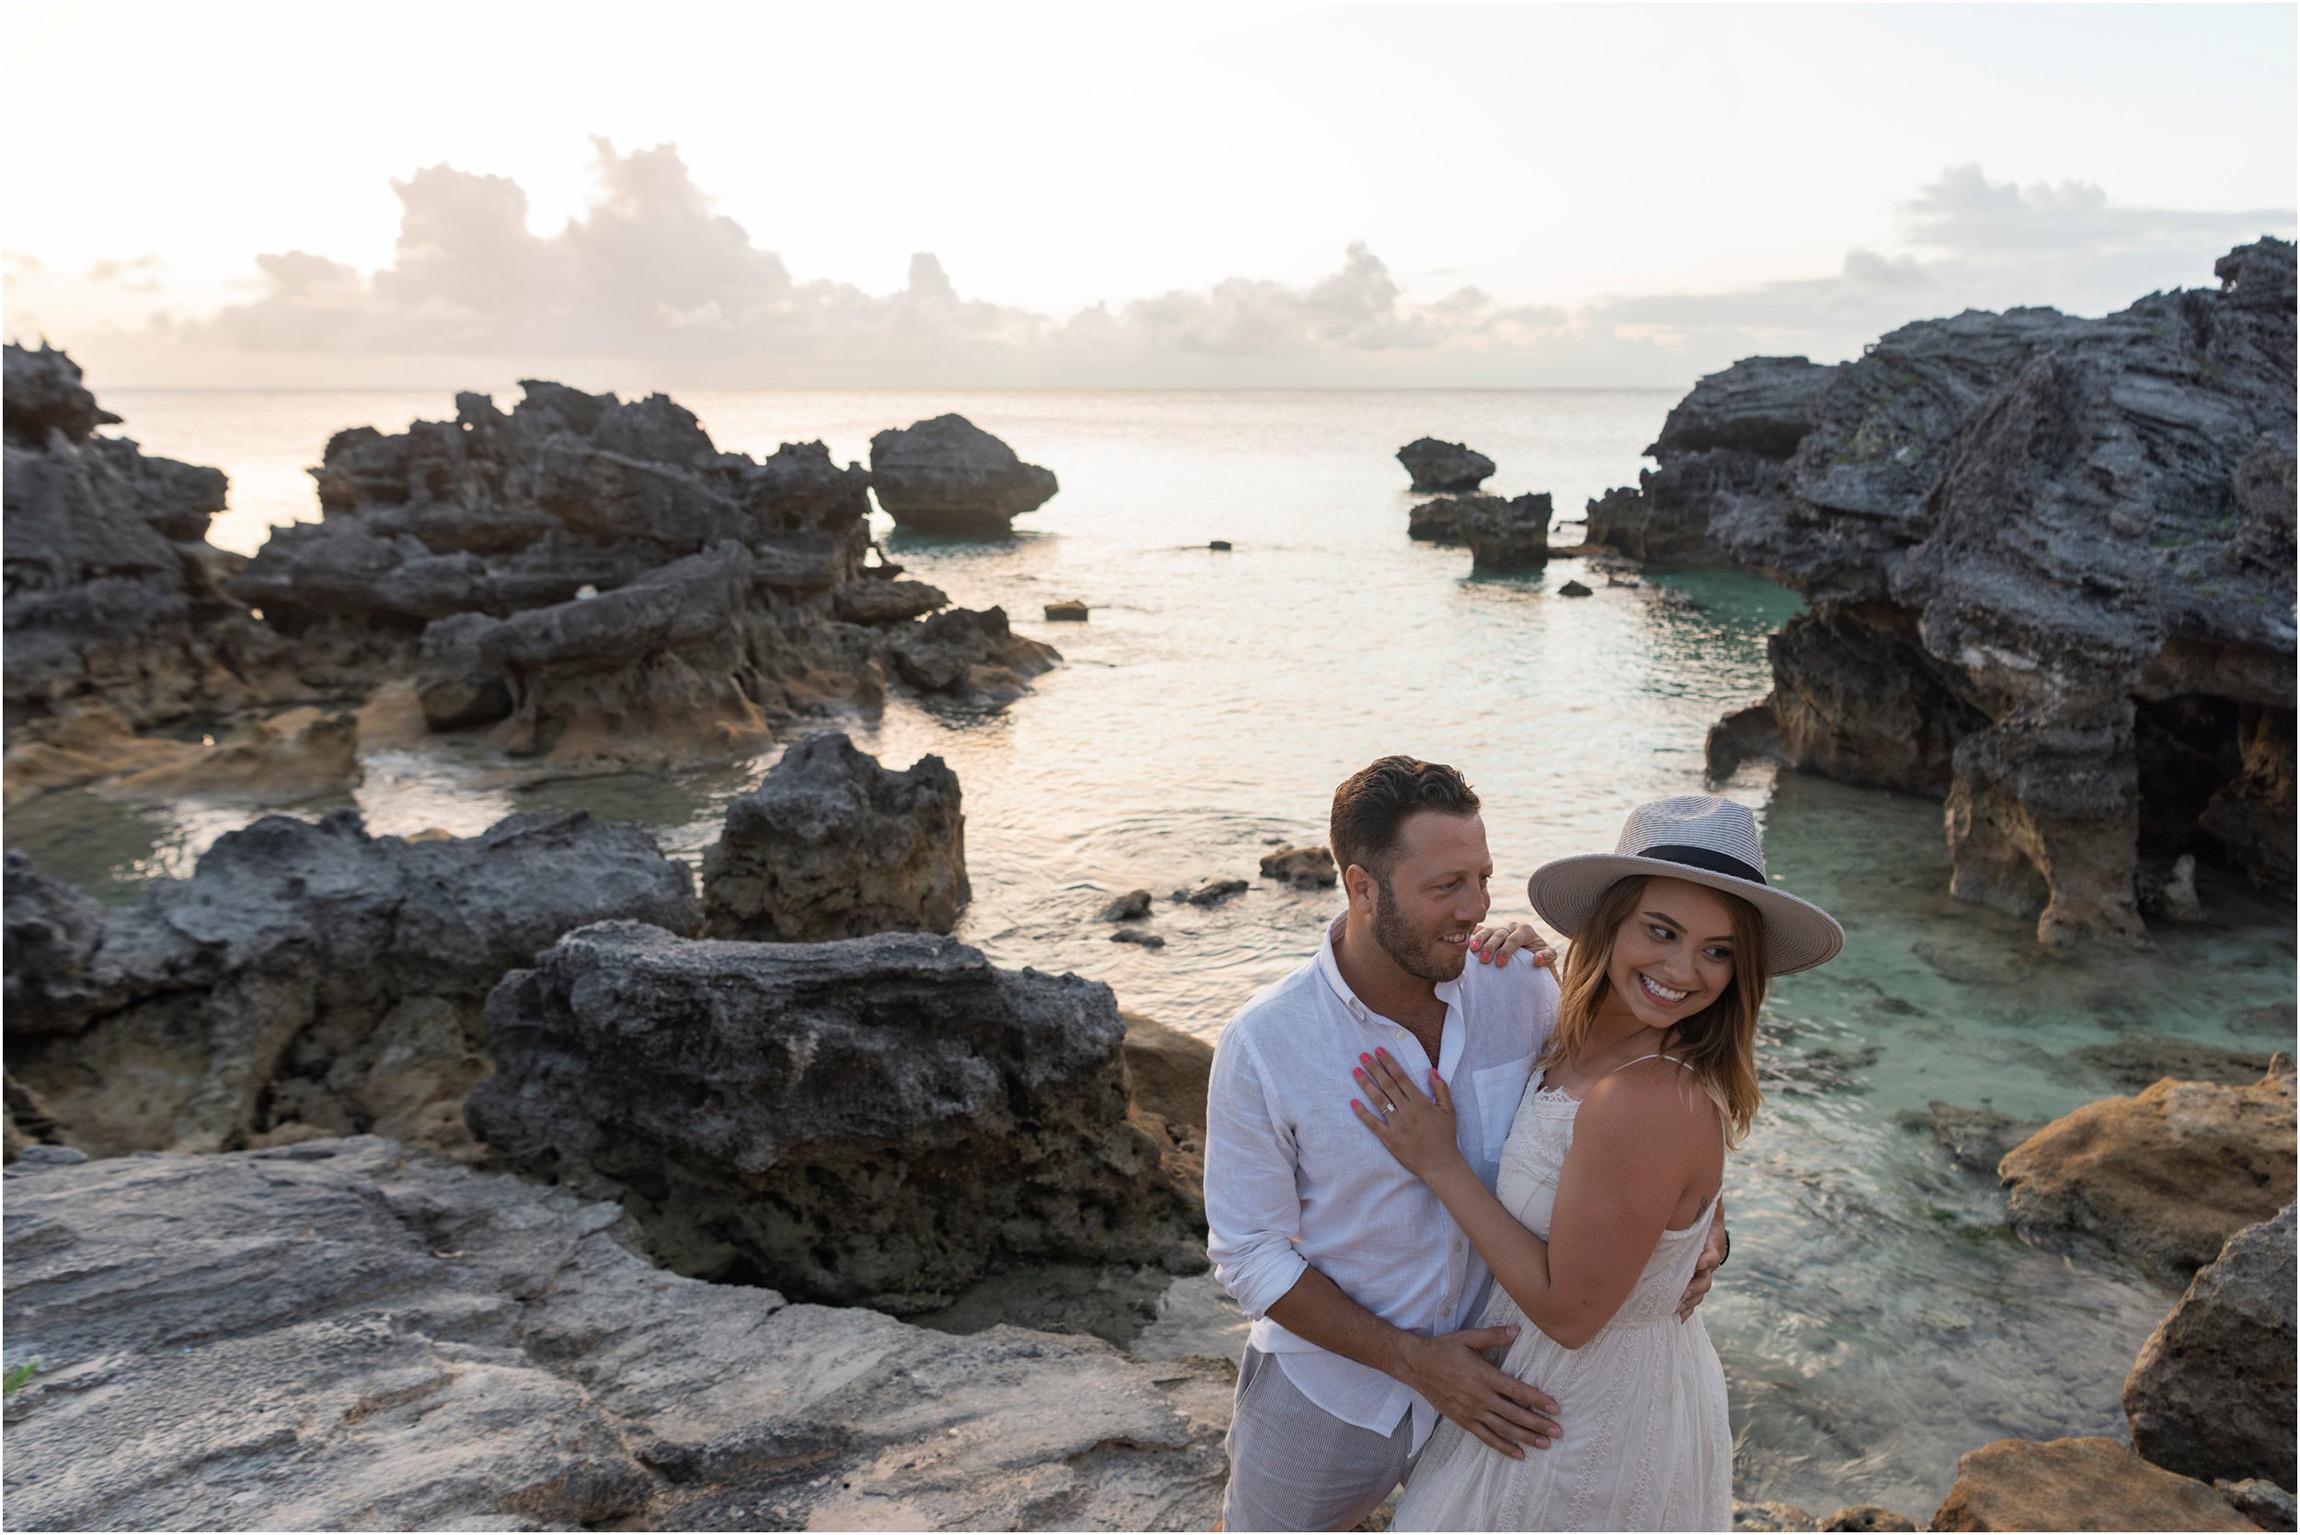 ©FianderFoto_Bermuda Engagement Photographer_St Georges_Danielle_David_017.jpg